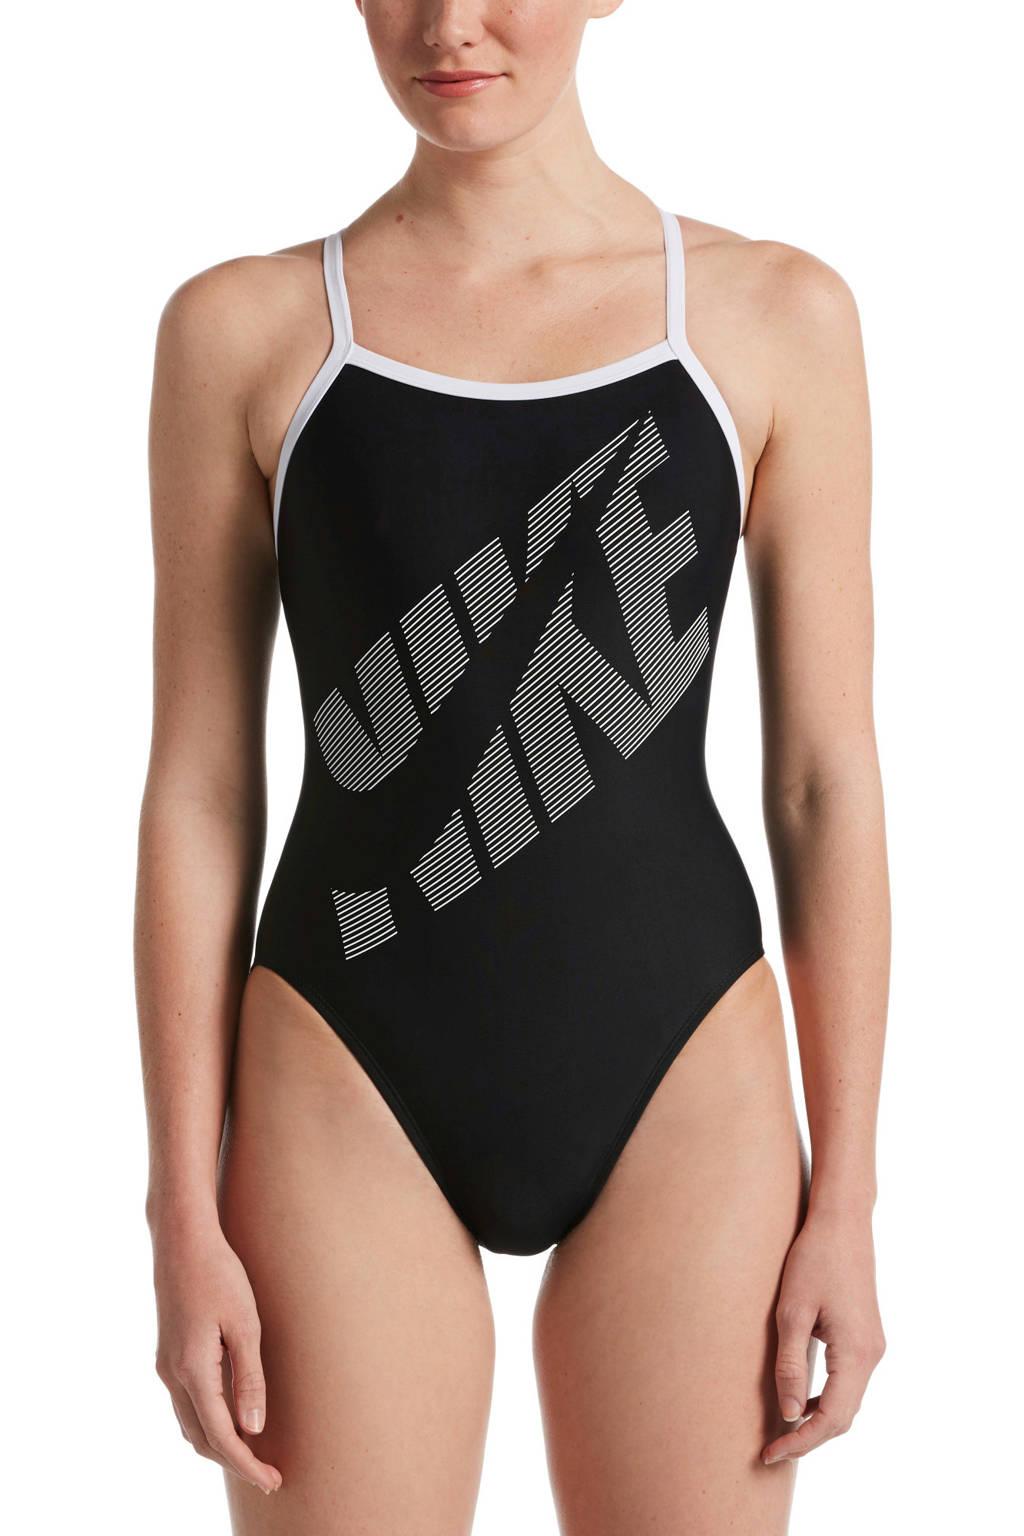 Nike sportbadpak Tilt zwart/wit, Zwart/wit